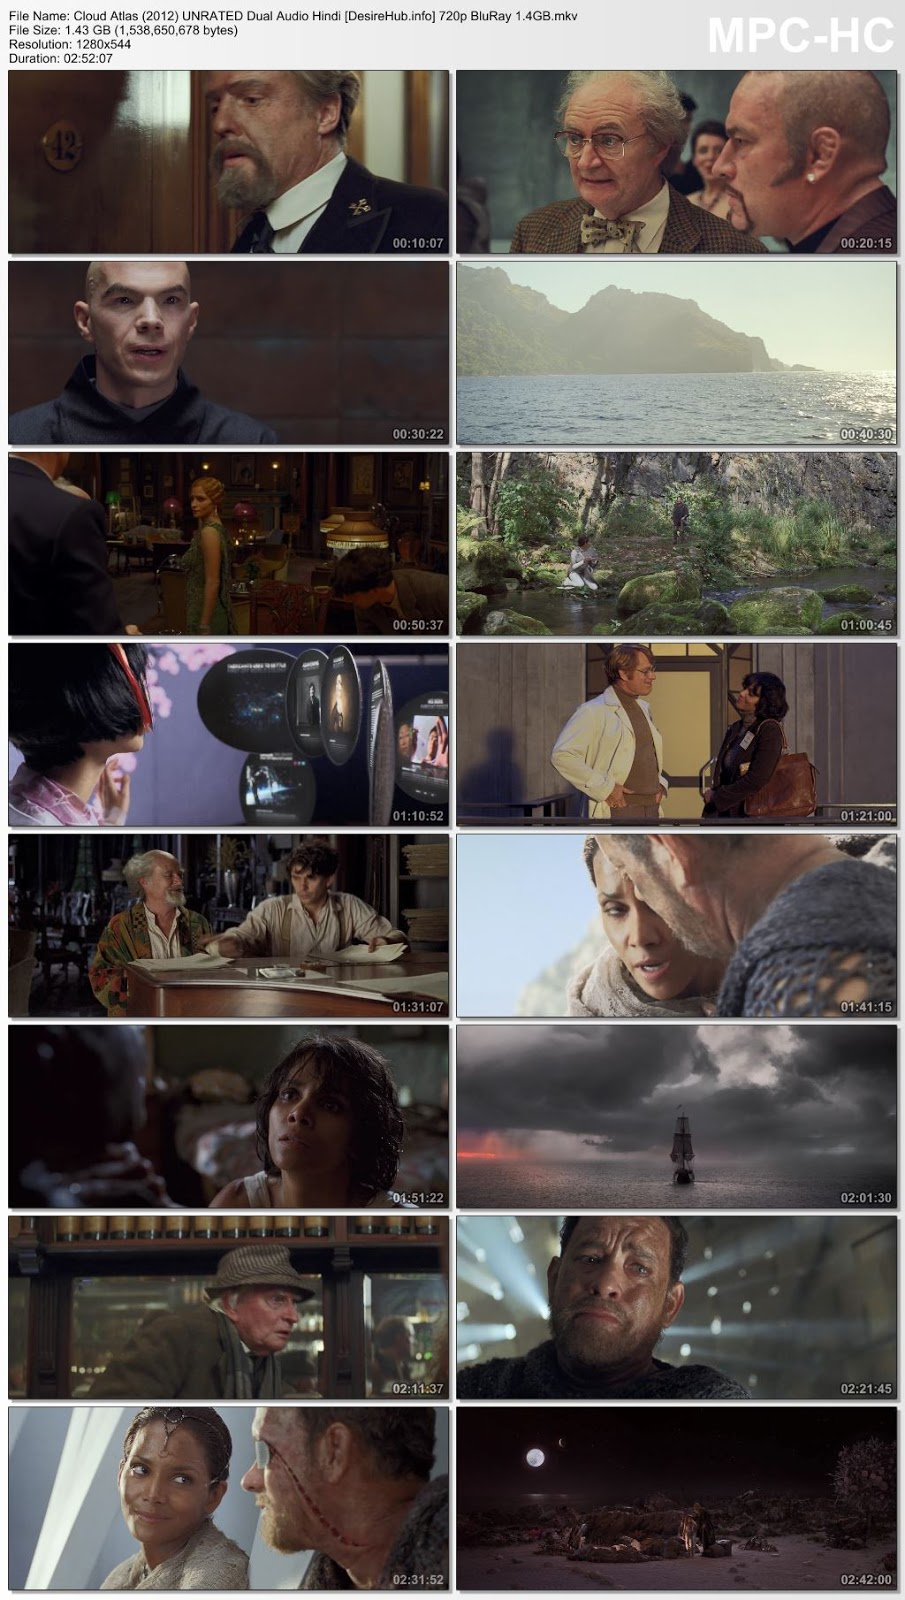 Cloud Atlas (2012) UNRATED Dual Audio Hindi 480p BluRay 500MB Desirehub